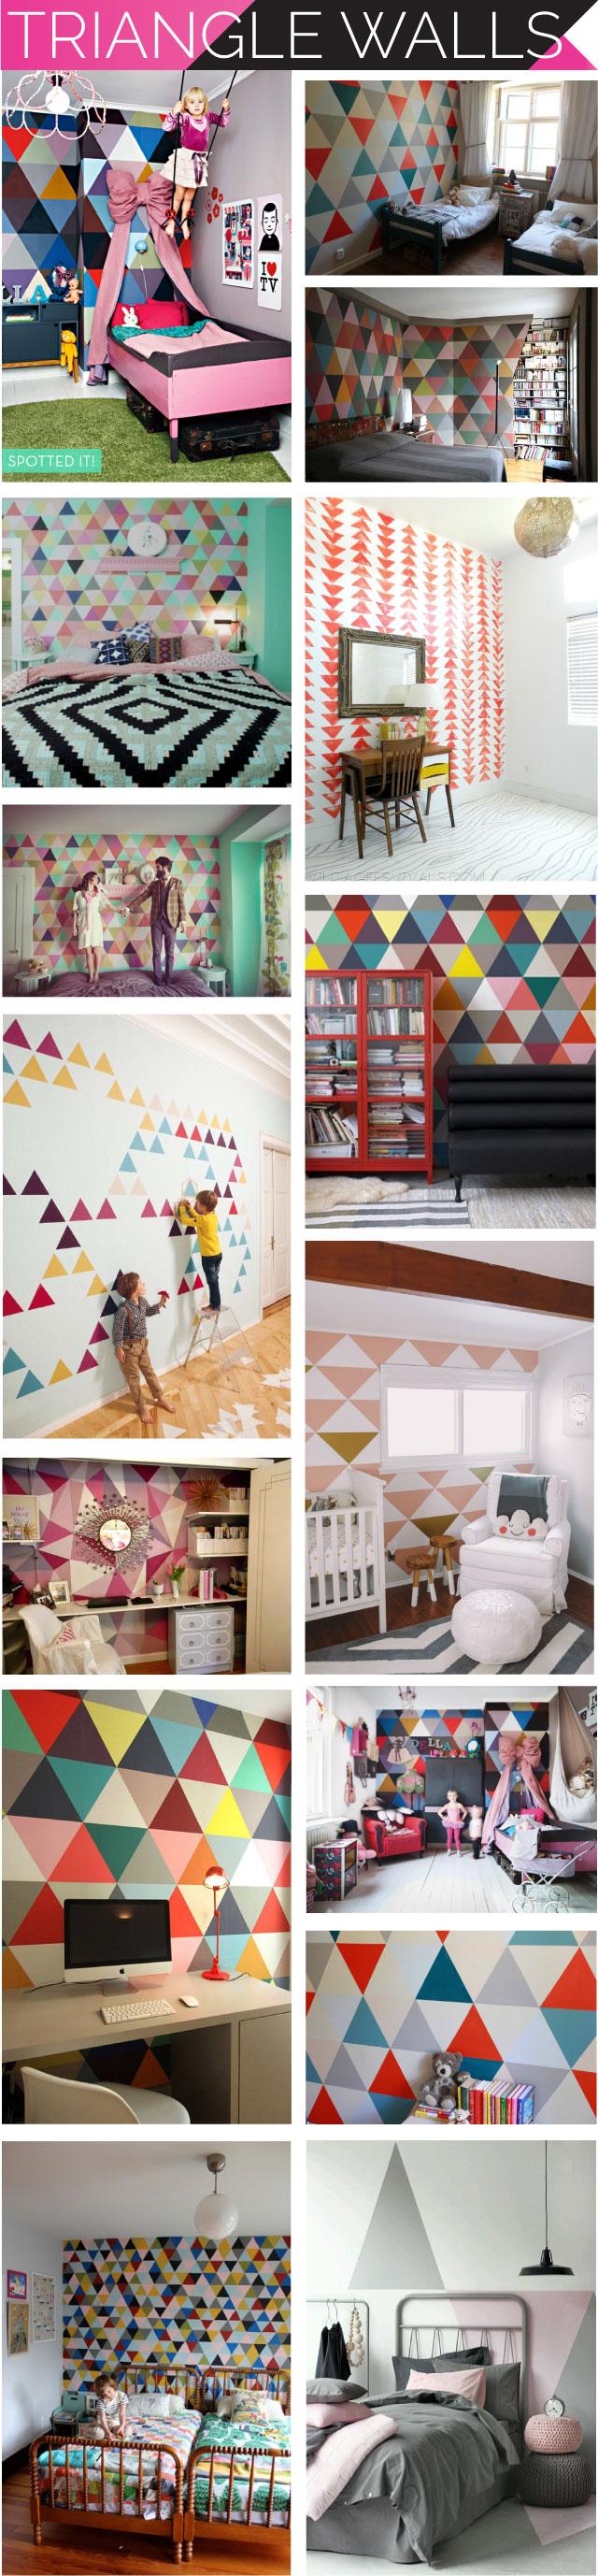 triangle-walls